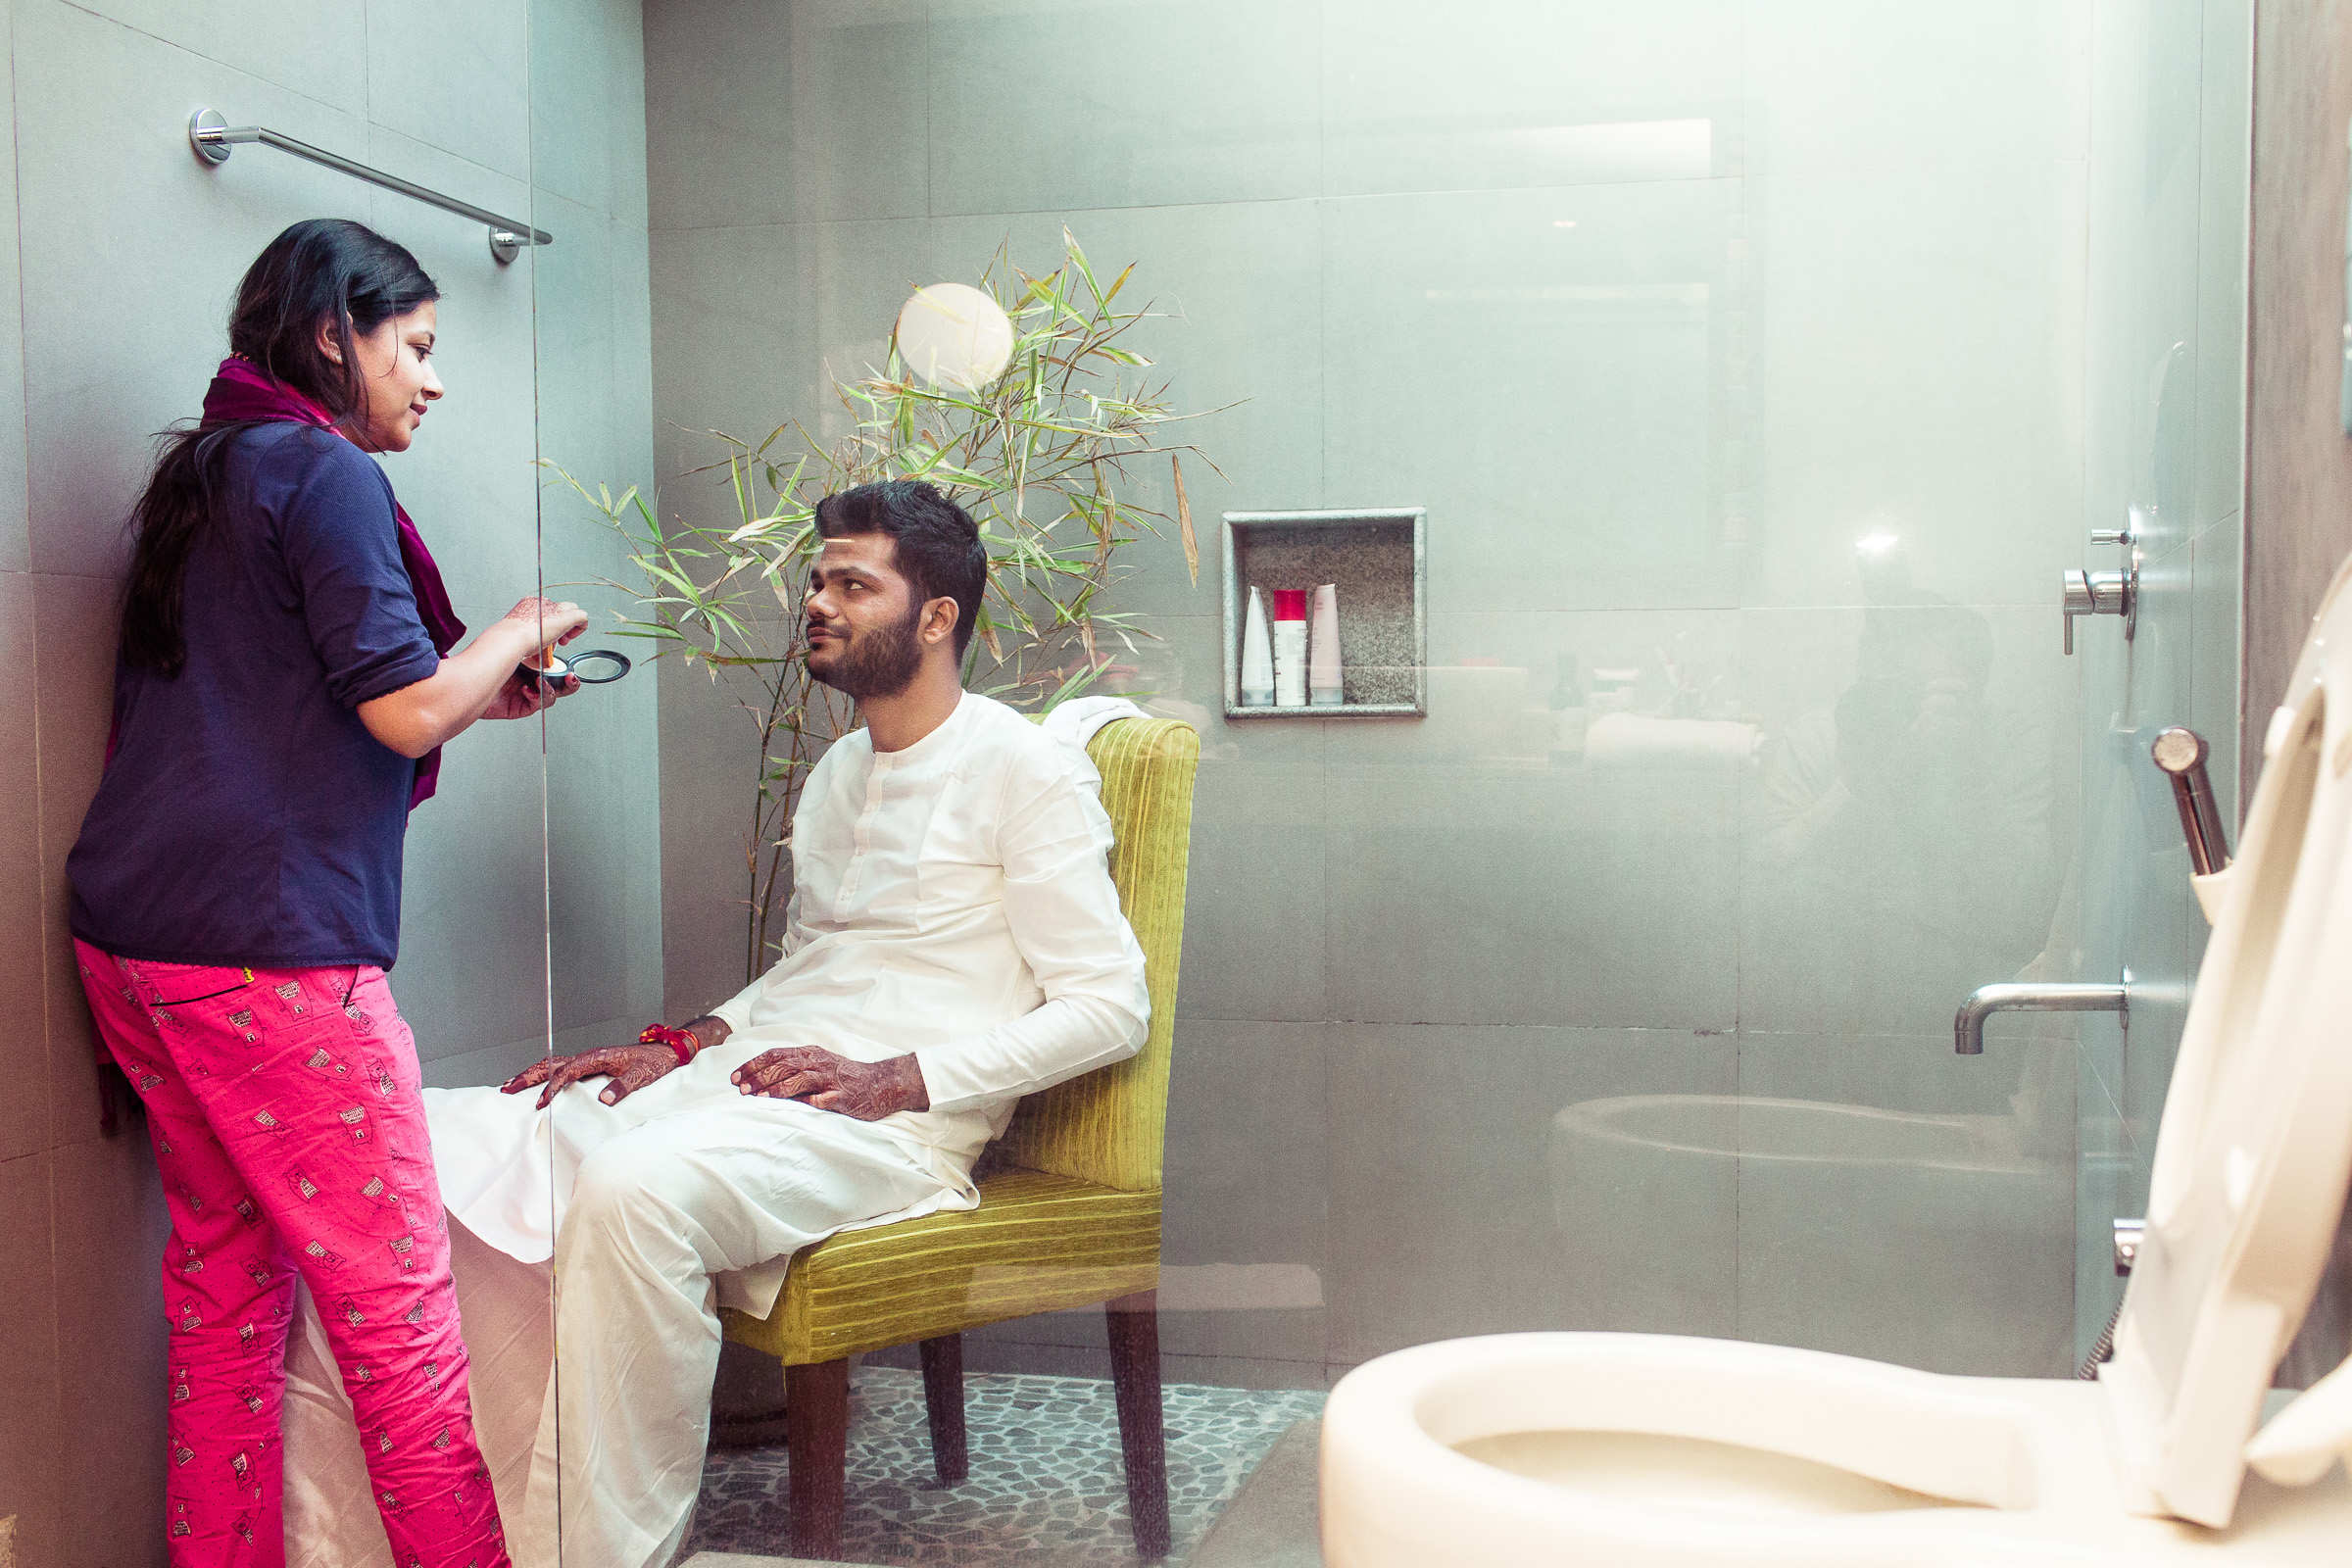 marwari-candid-wedding-photographers-bangalore-0001.jpg